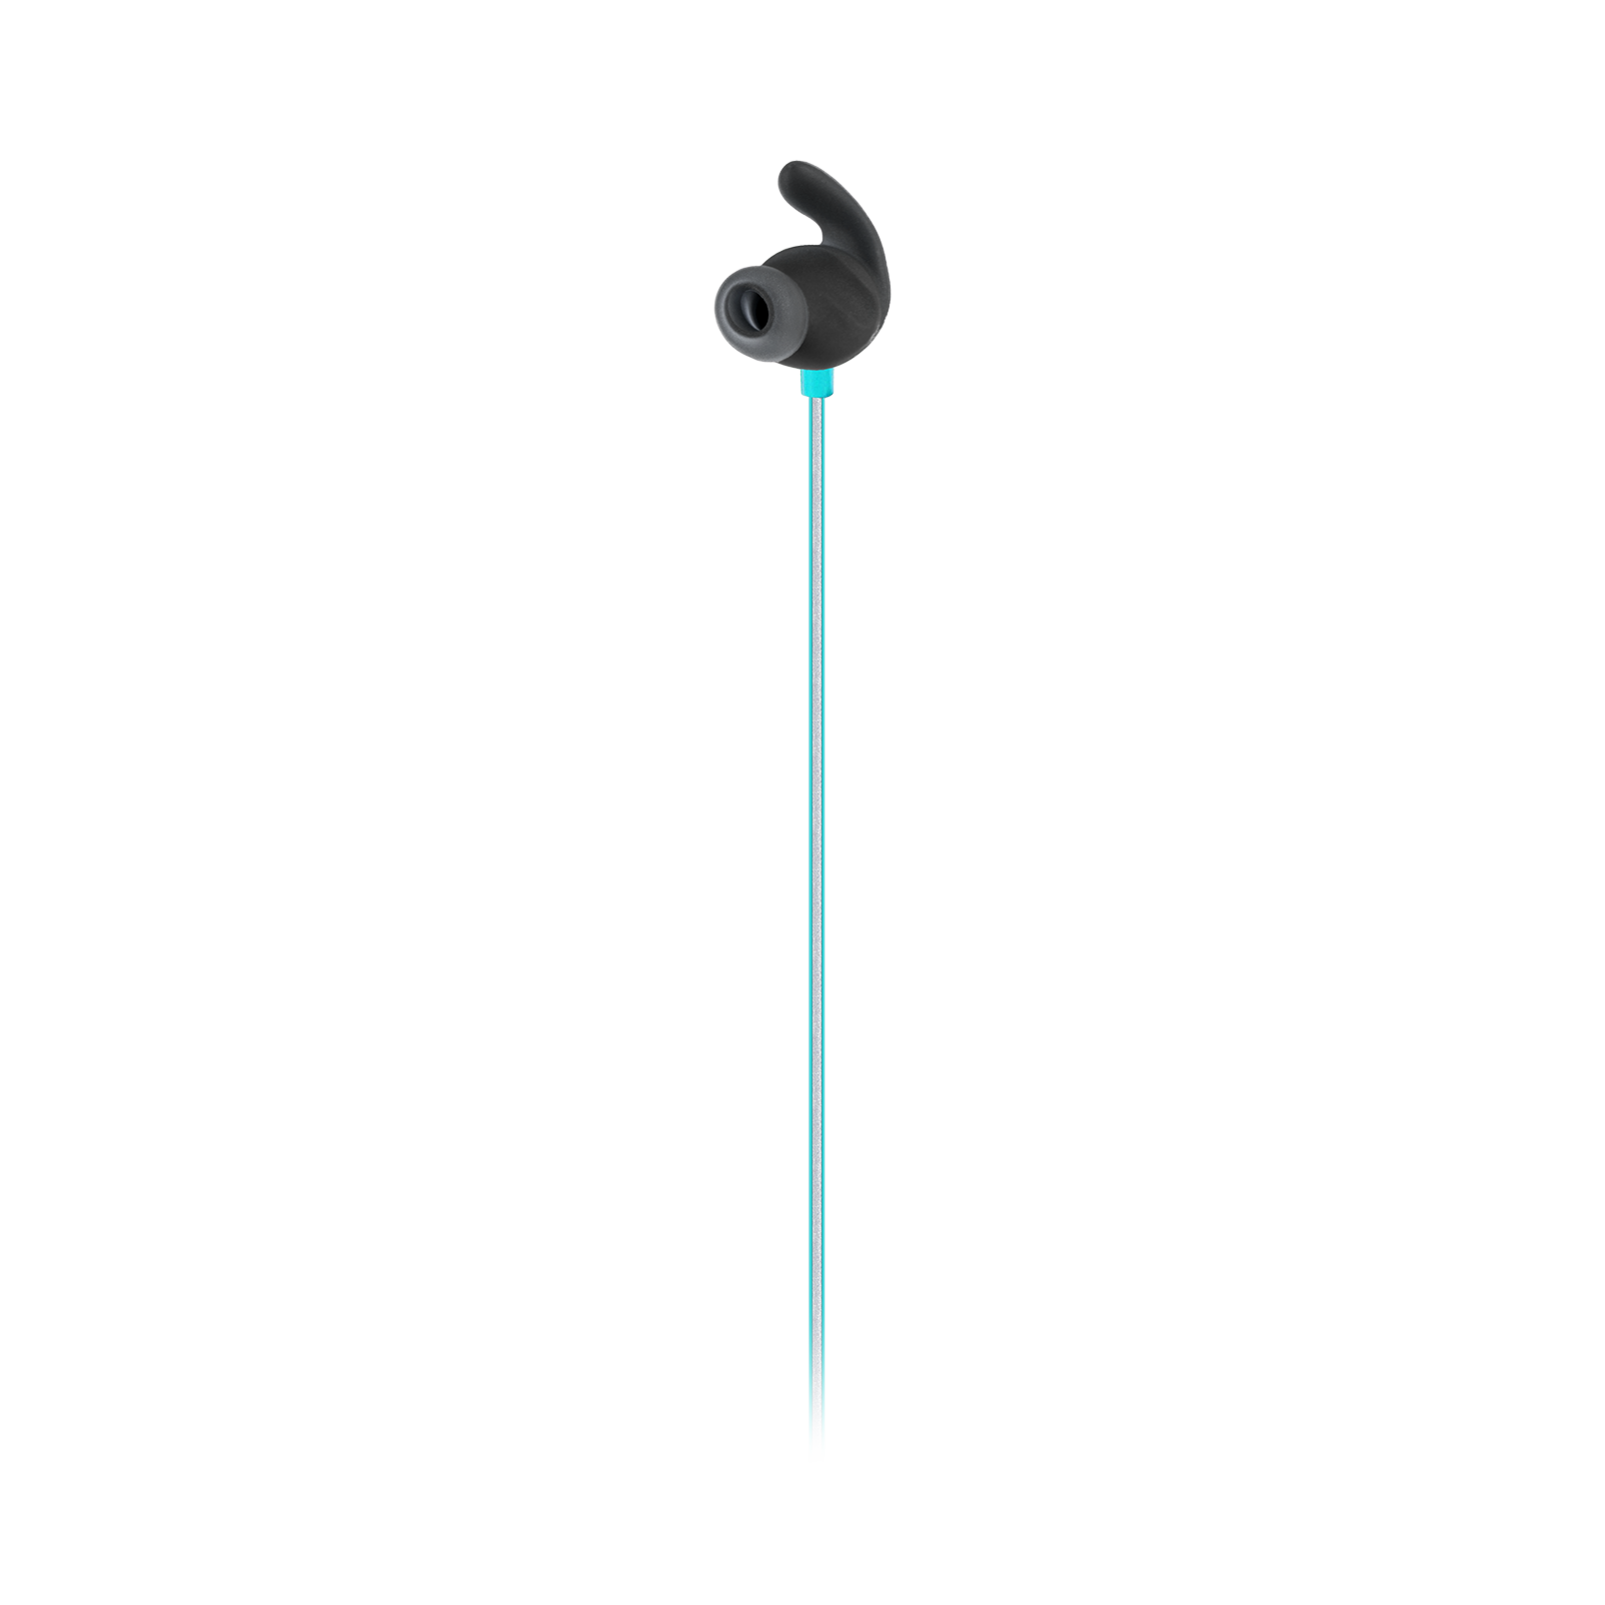 Reflect Mini - Teal - Lightweight, in-ear sport headphones - Detailshot 2